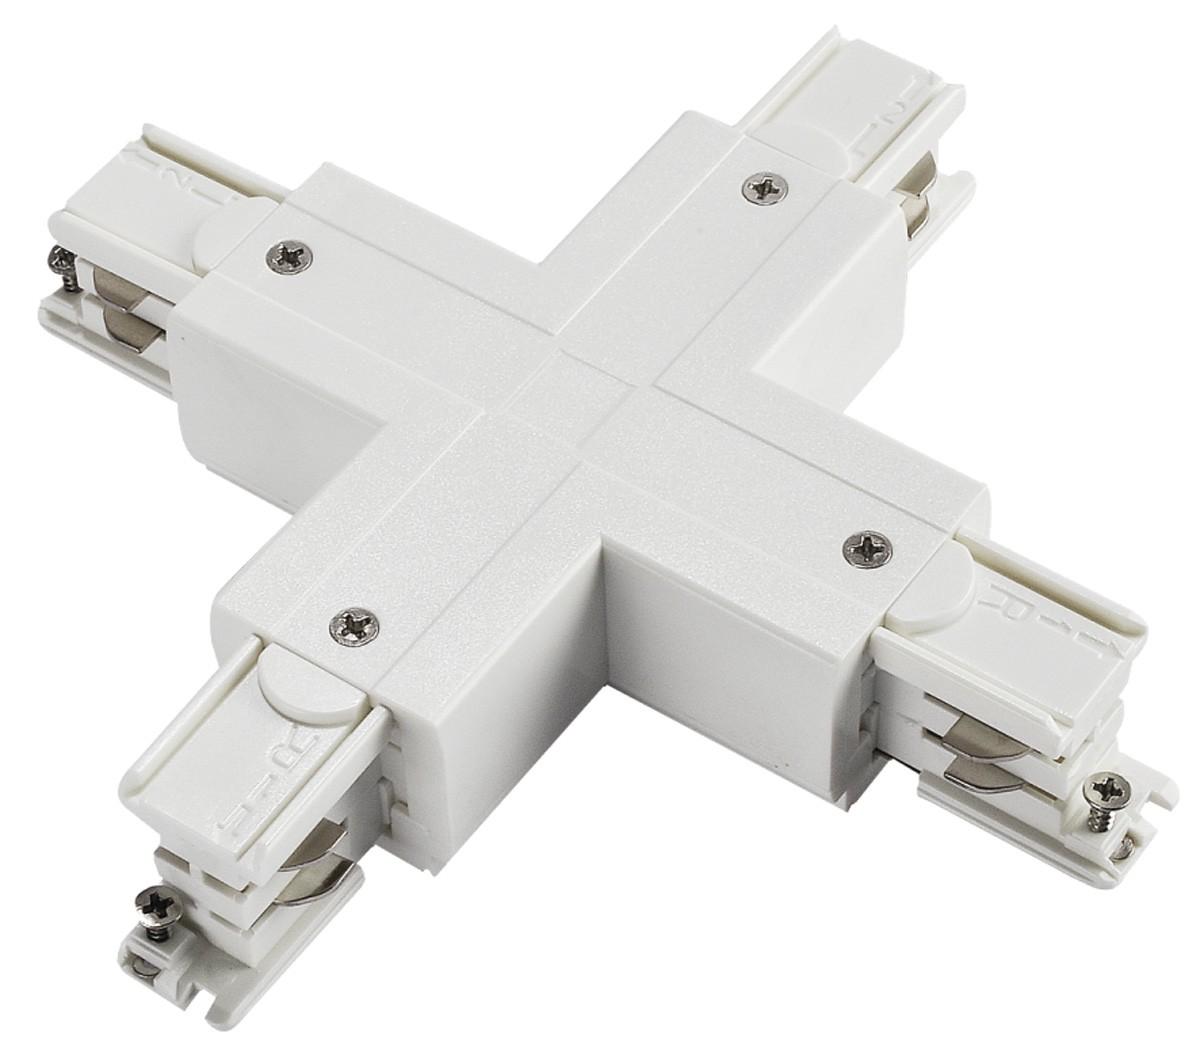 Powergear Lighting X Connector